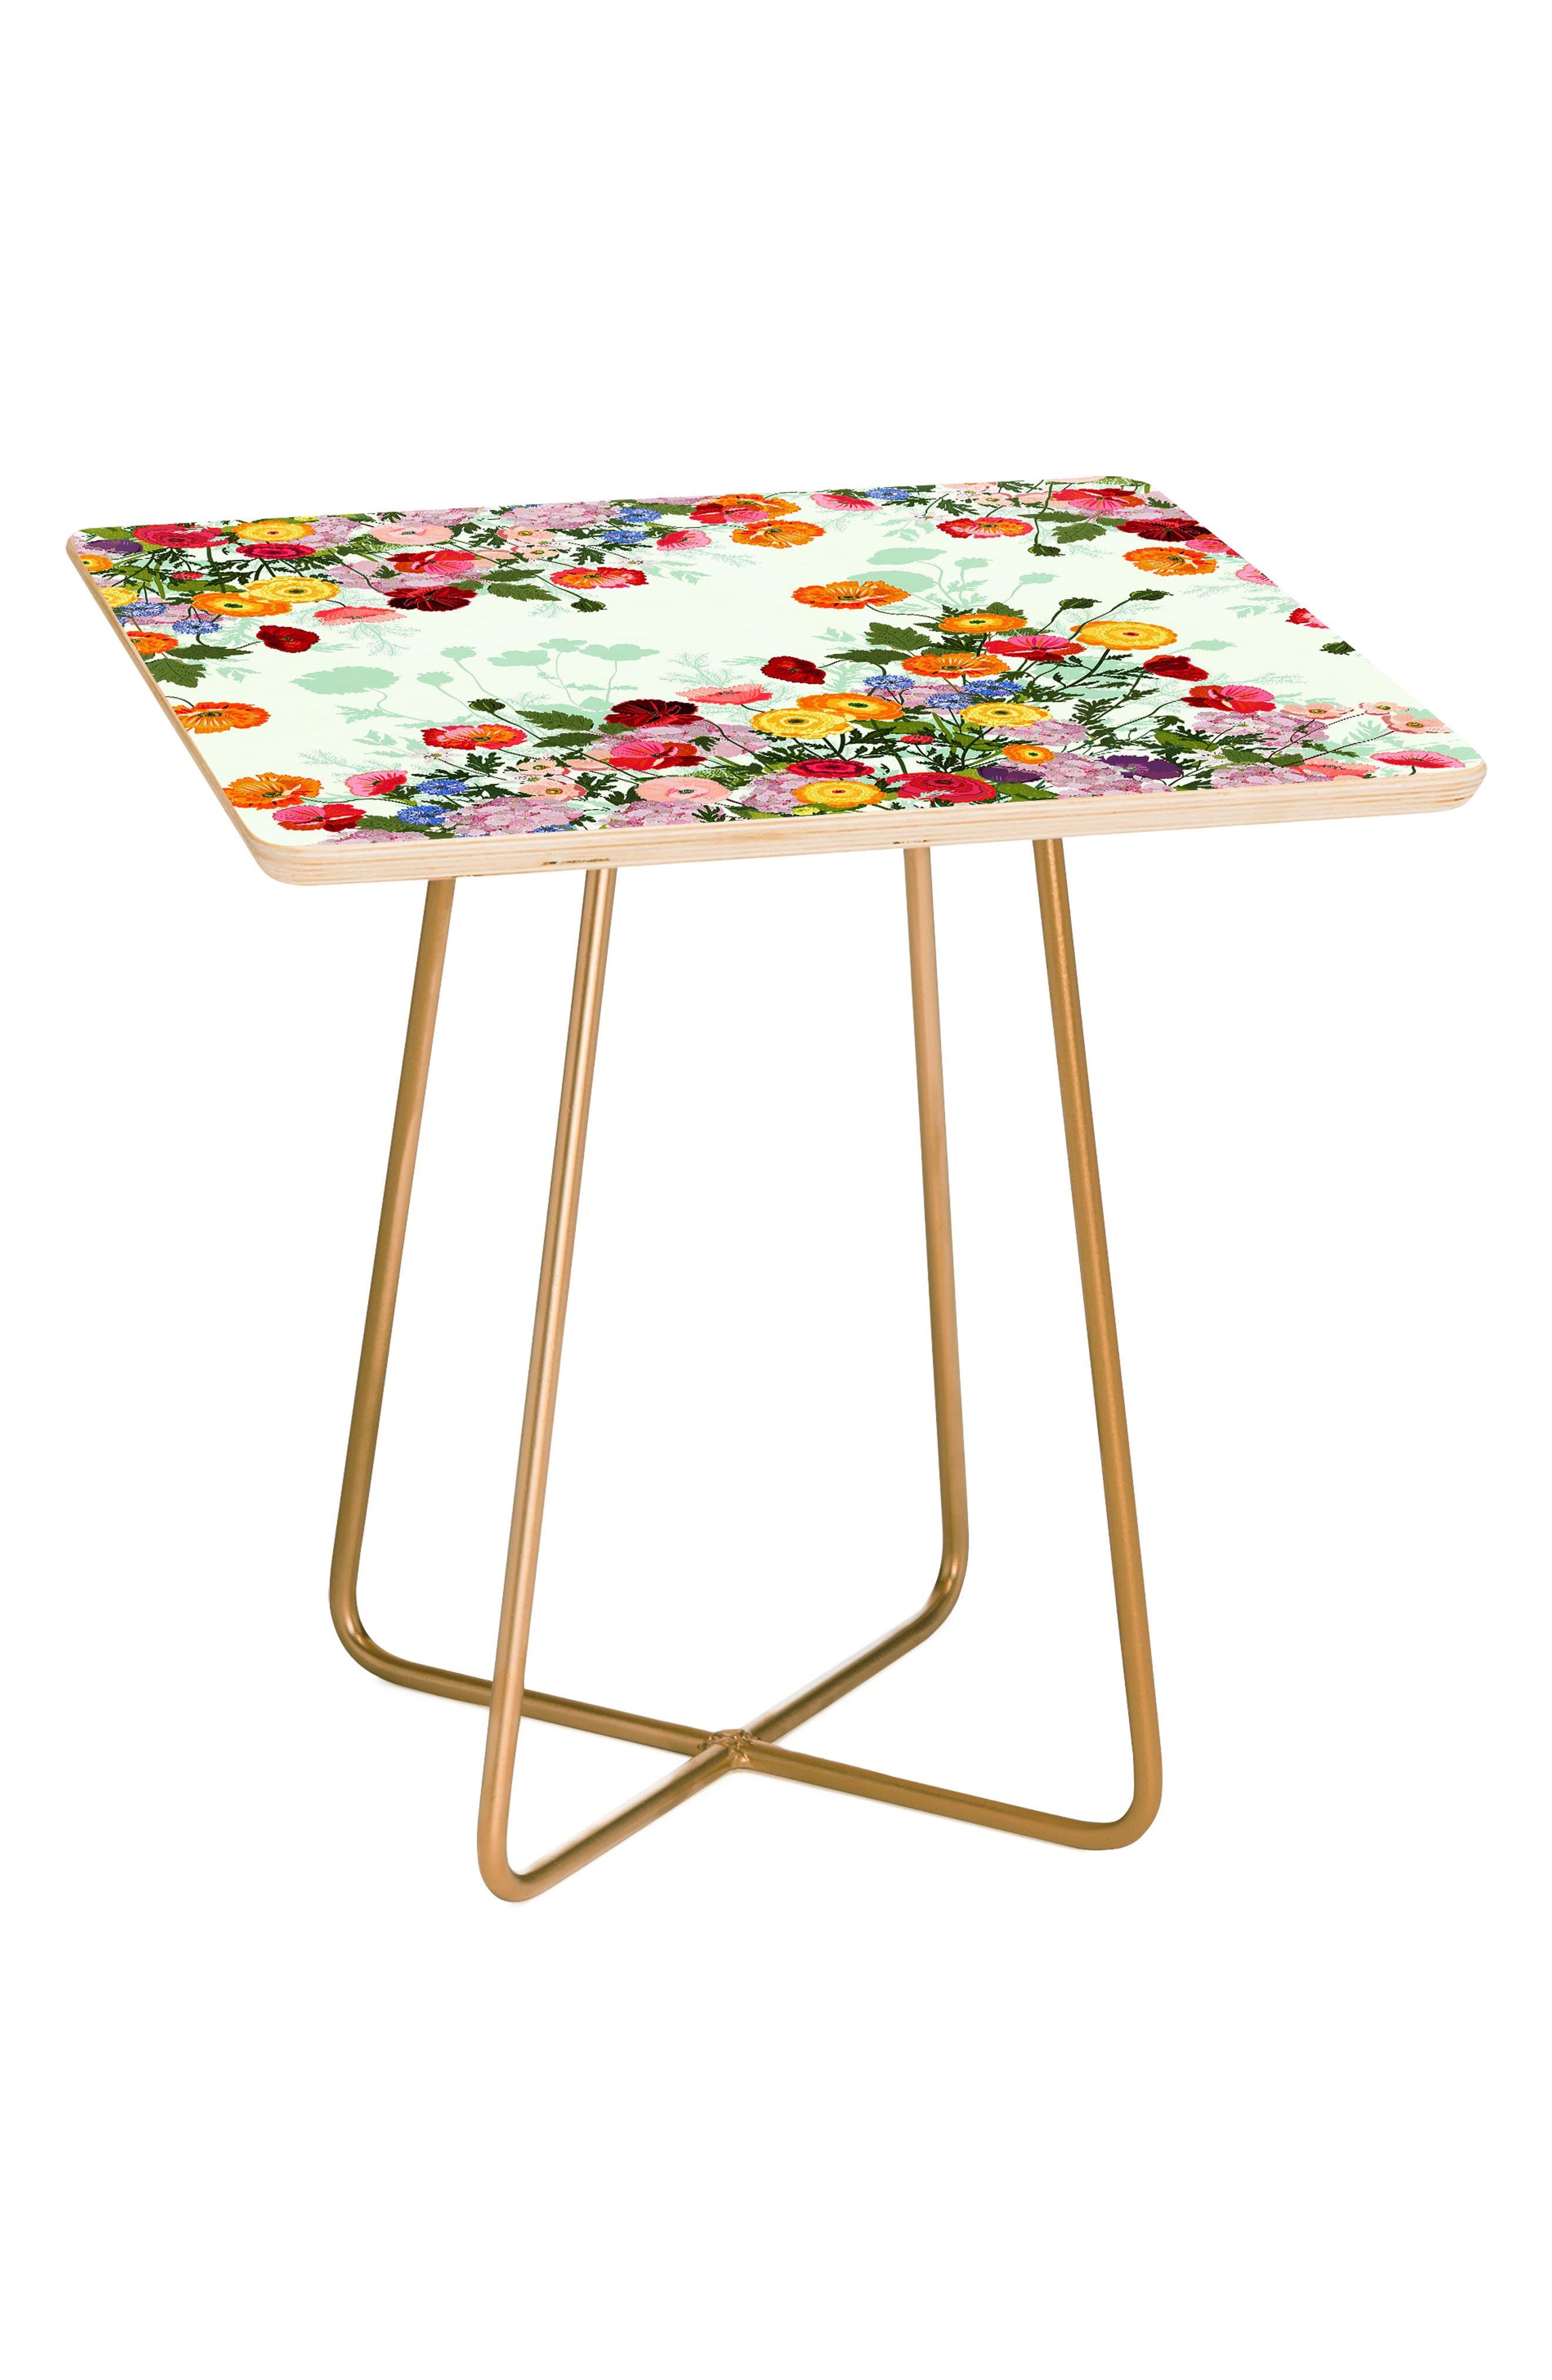 DENY DESIGNS Emmaline Side Table, Main, color, RED